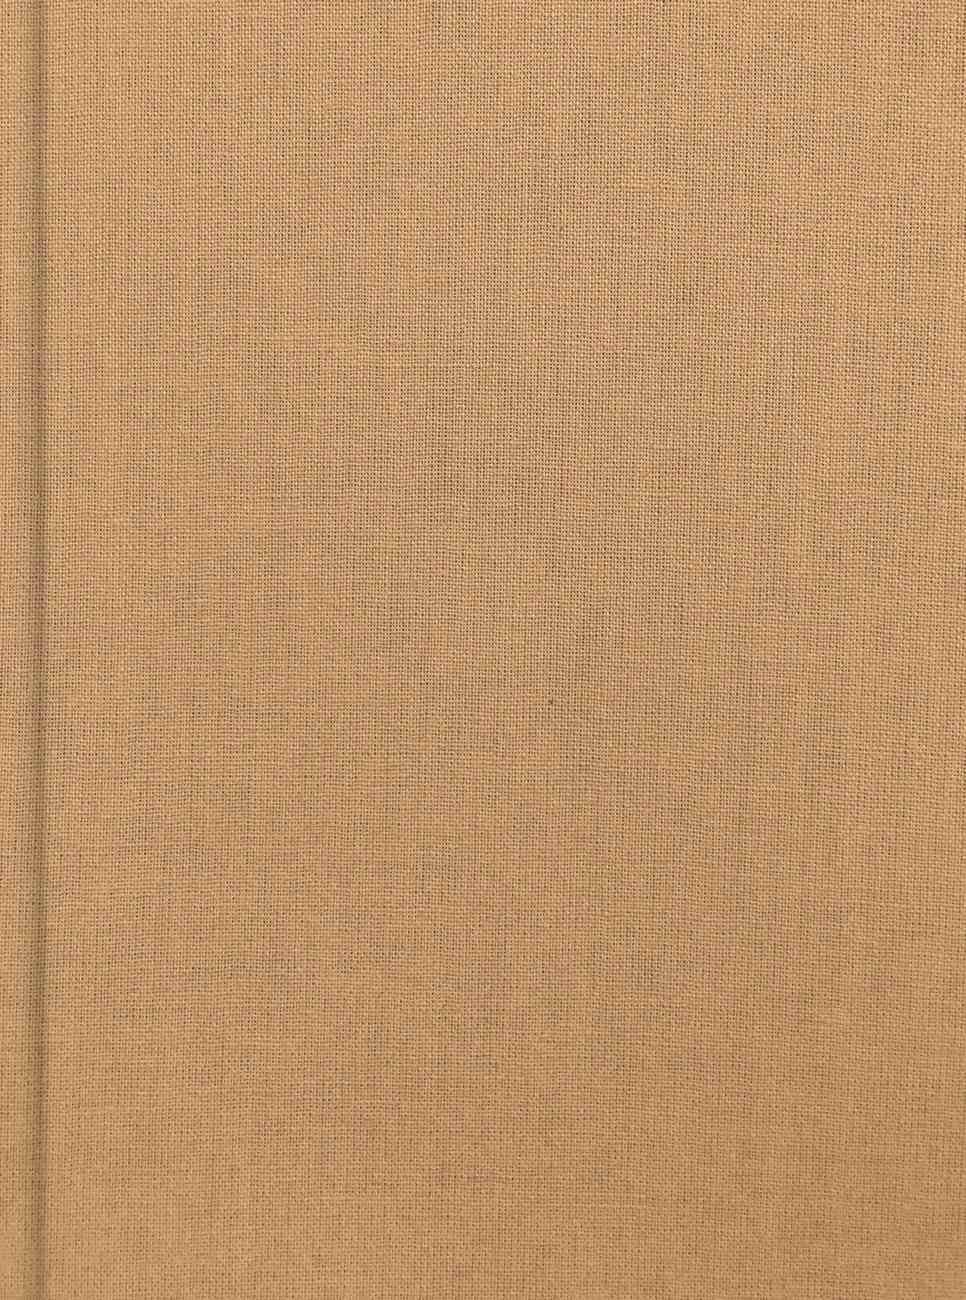 CSB Lifeway Women's Bible Camel (Black Letter Edition) Fabric Over Hardback